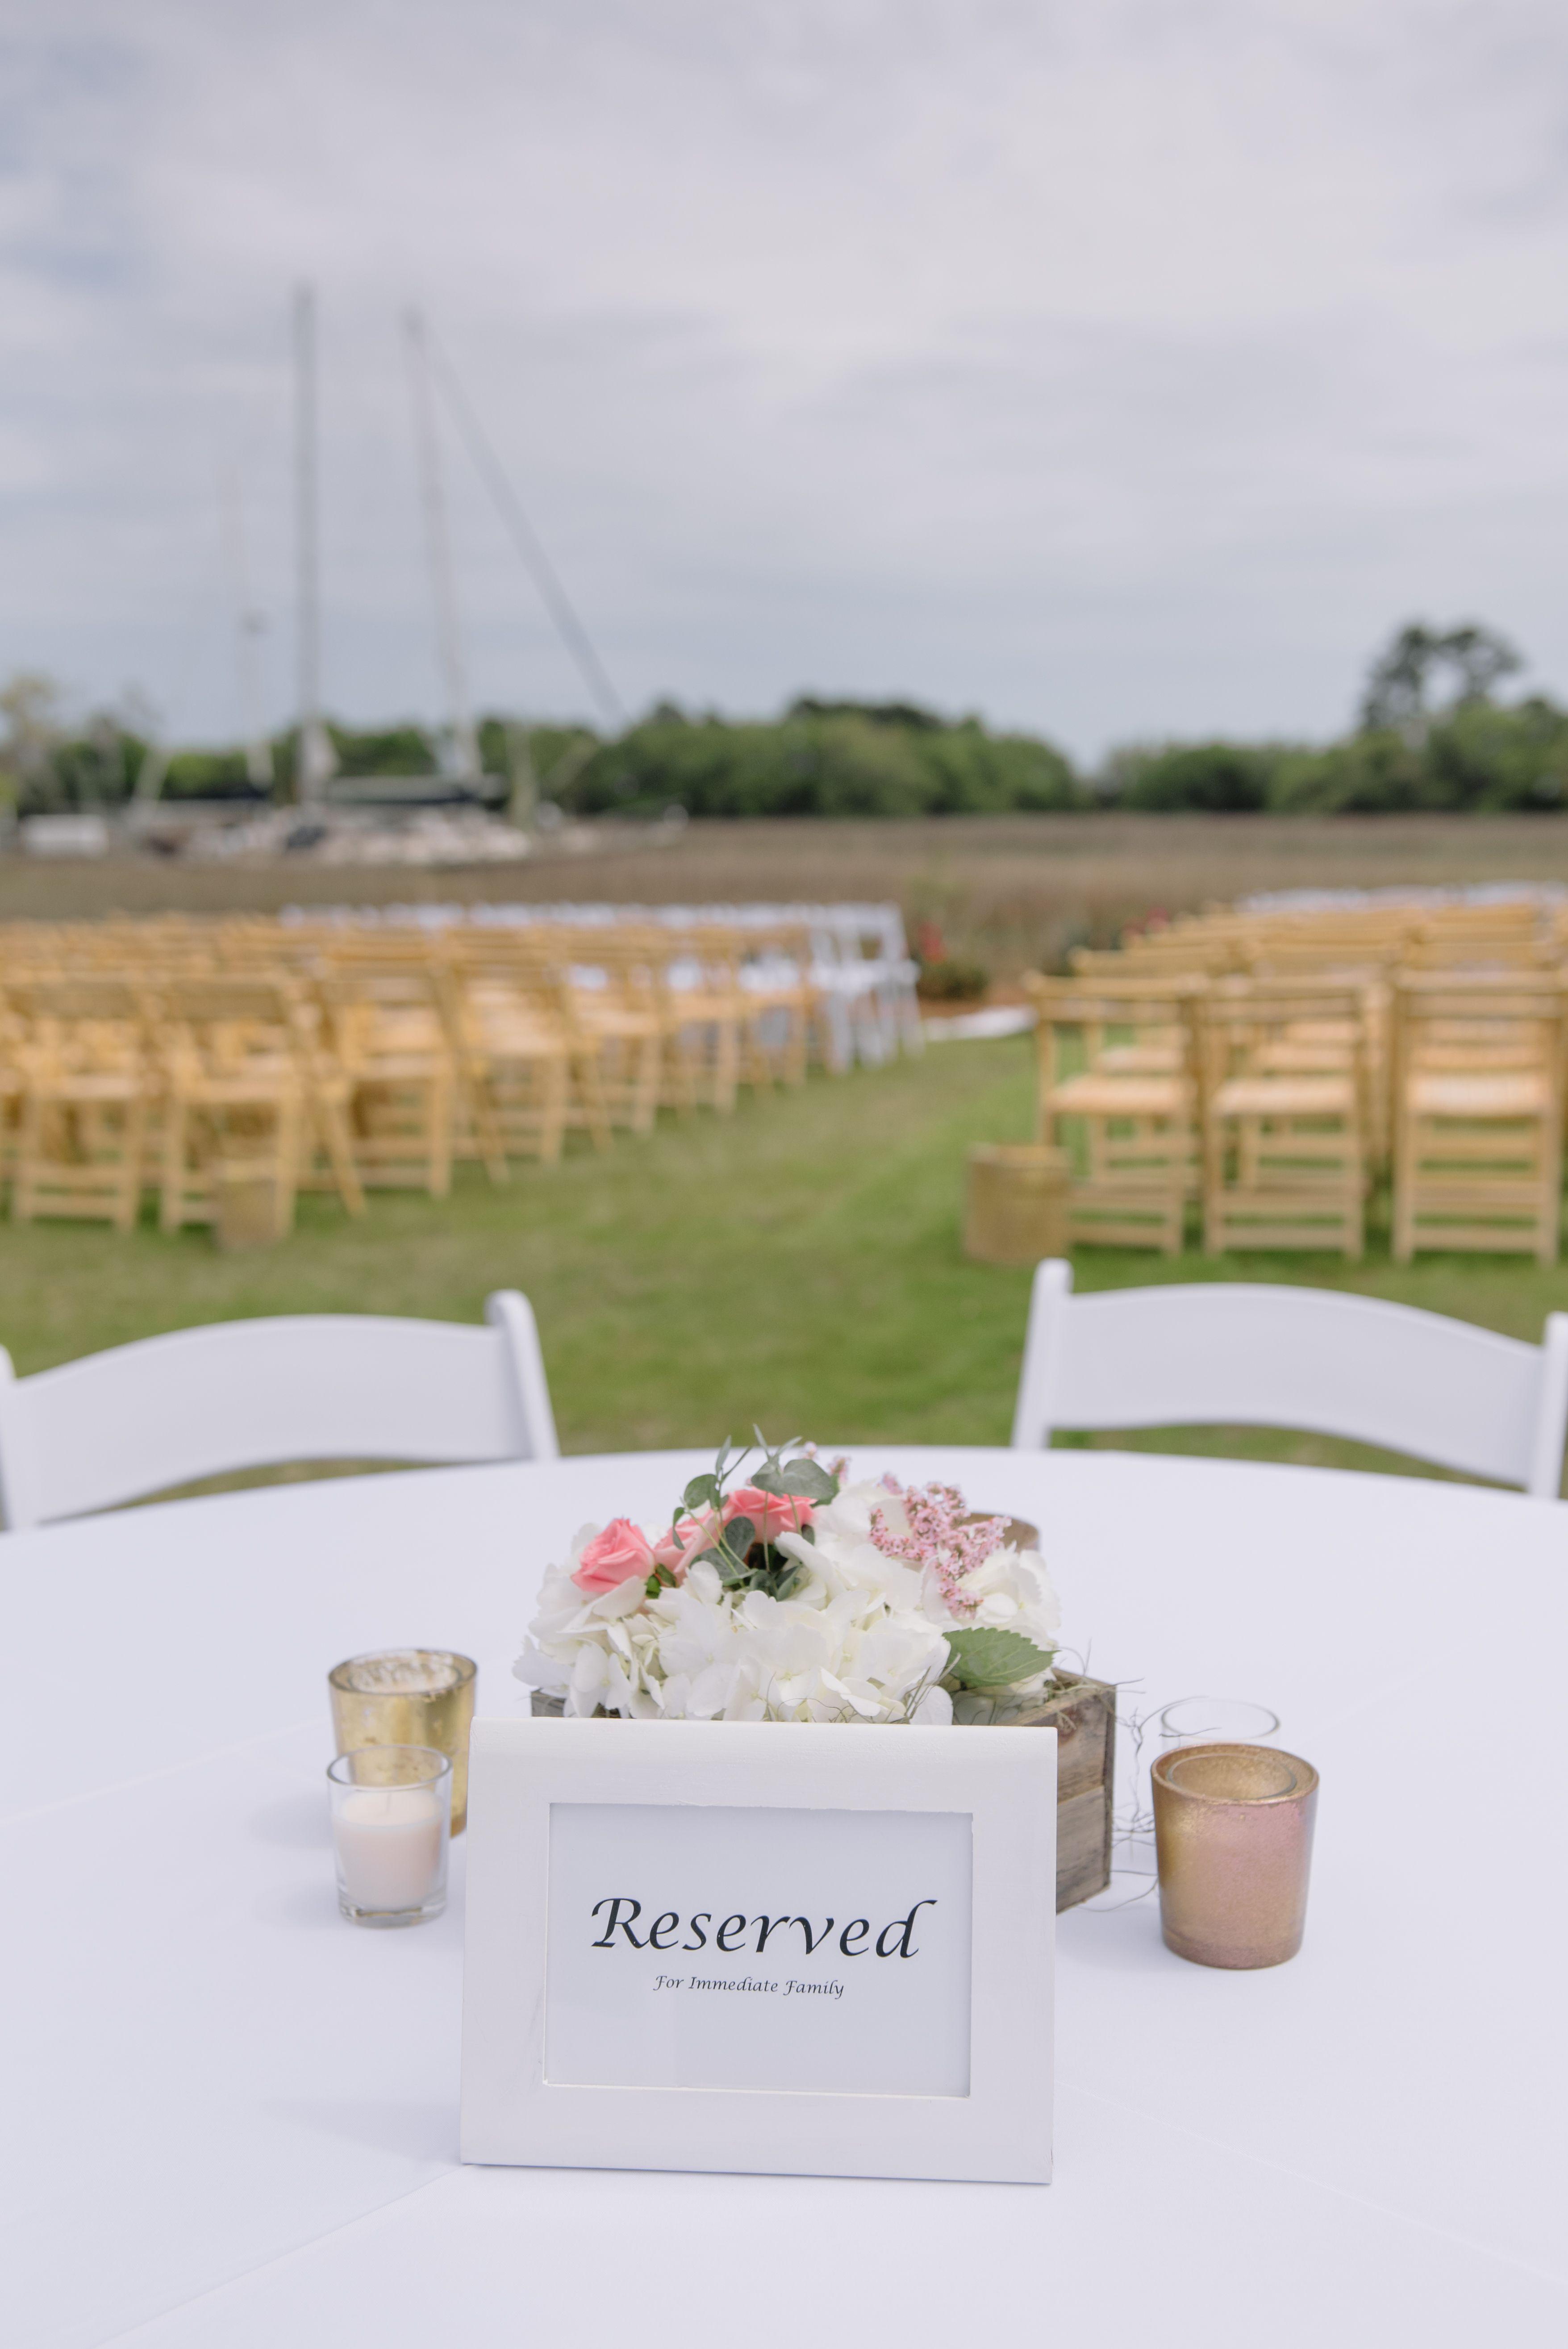 Table decorations wedding centerpieces pinterest wedding table decorations junglespirit Choice Image